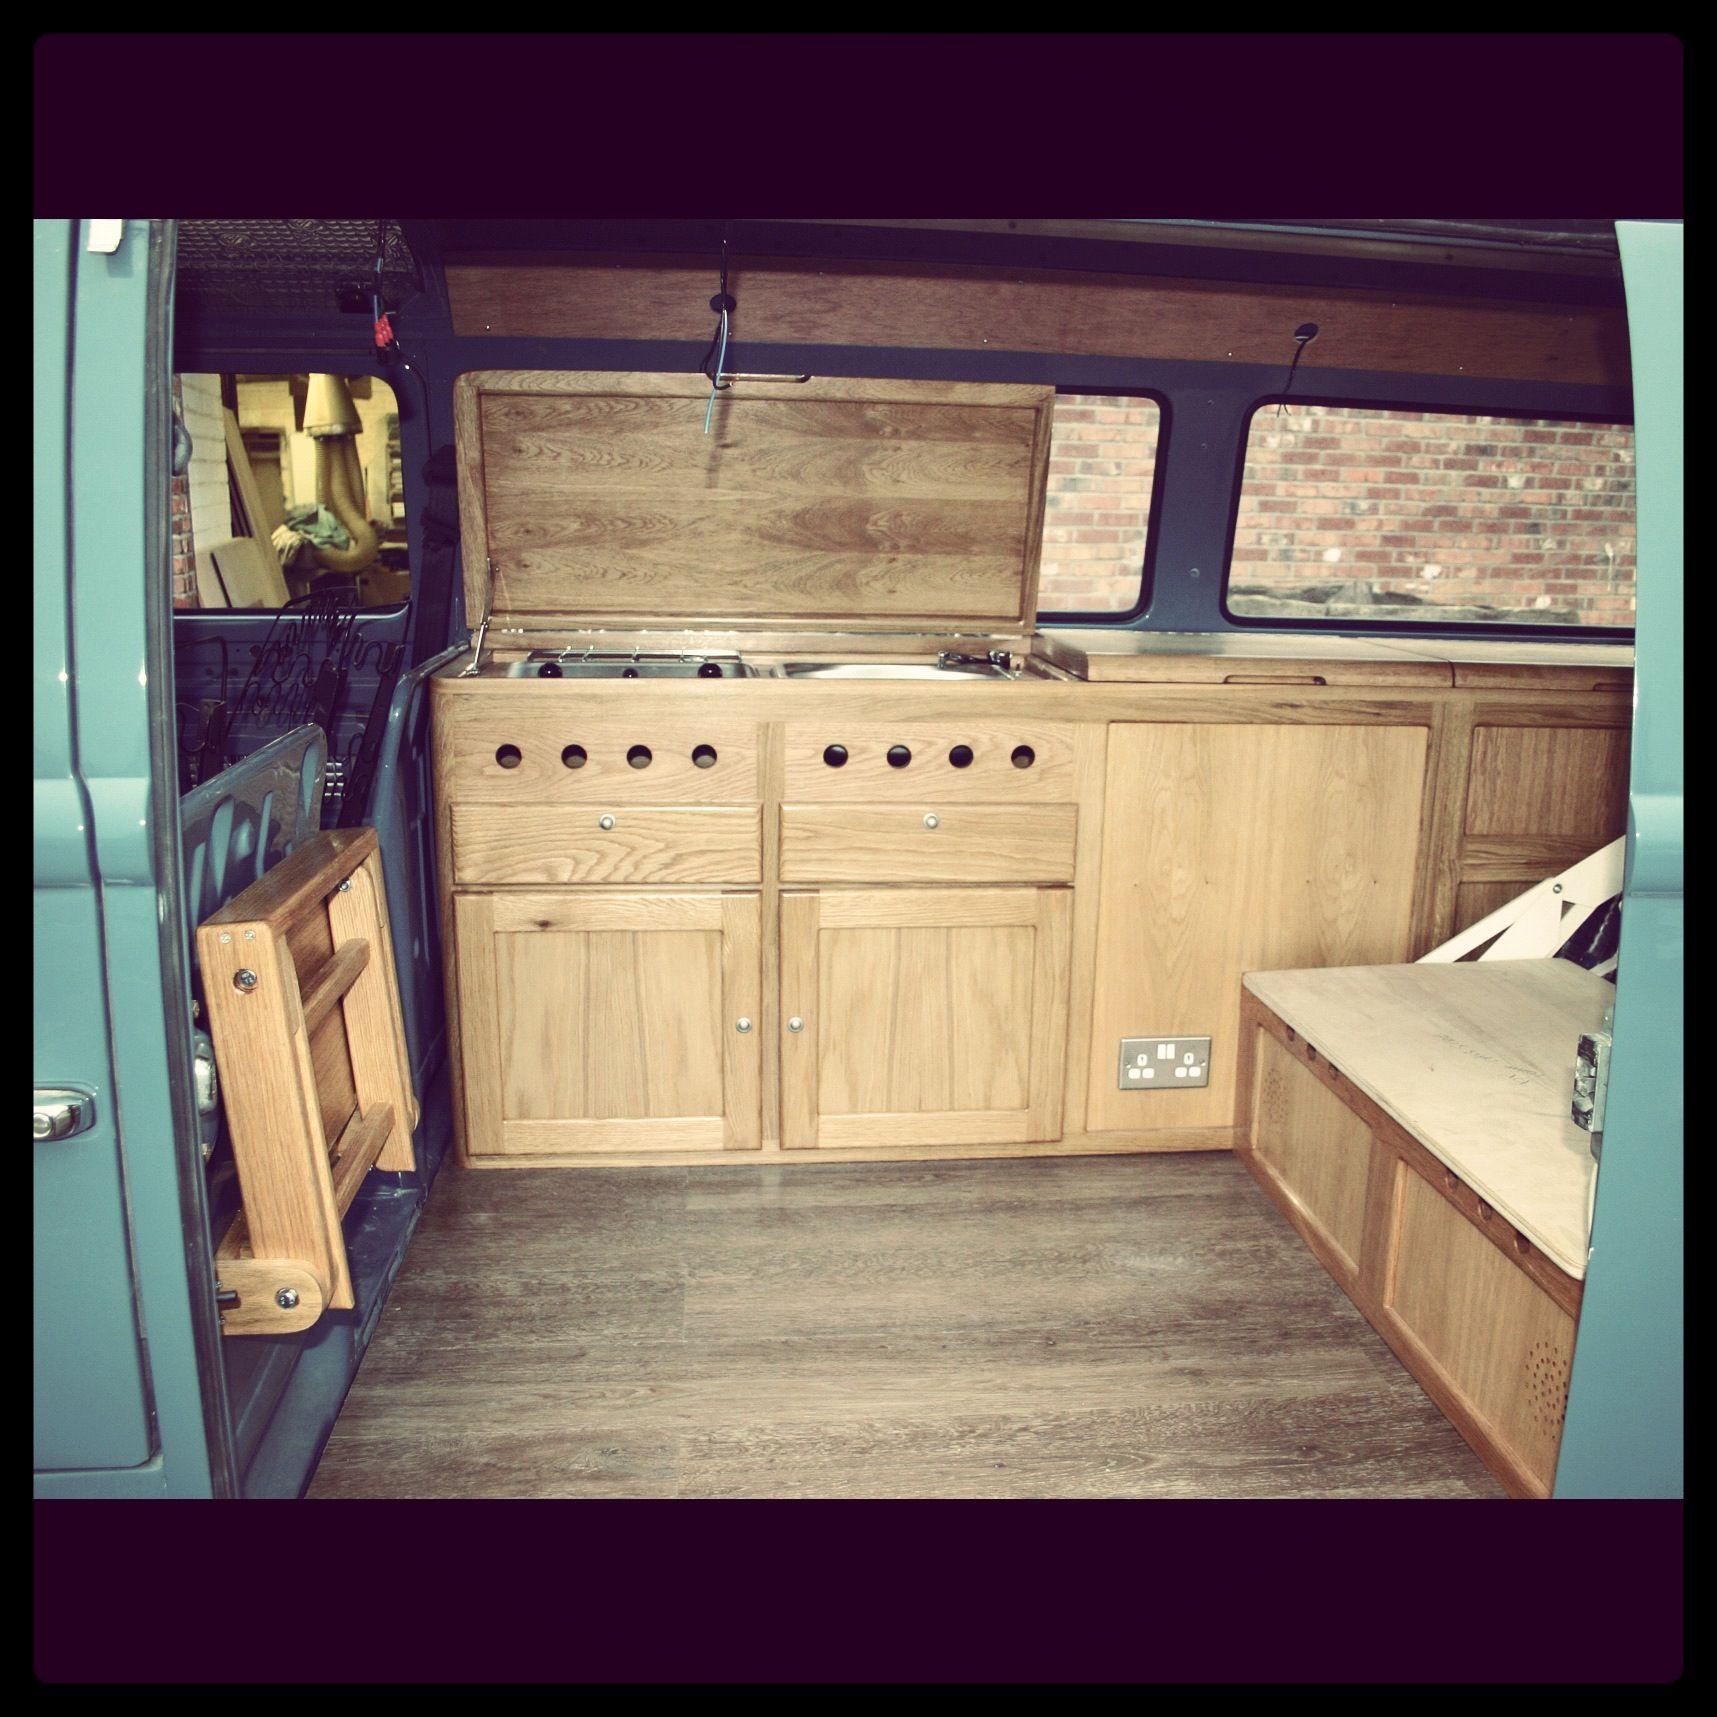 1000 images about vw ideas on pinterest vw forum vw for Vw camper van interior designs